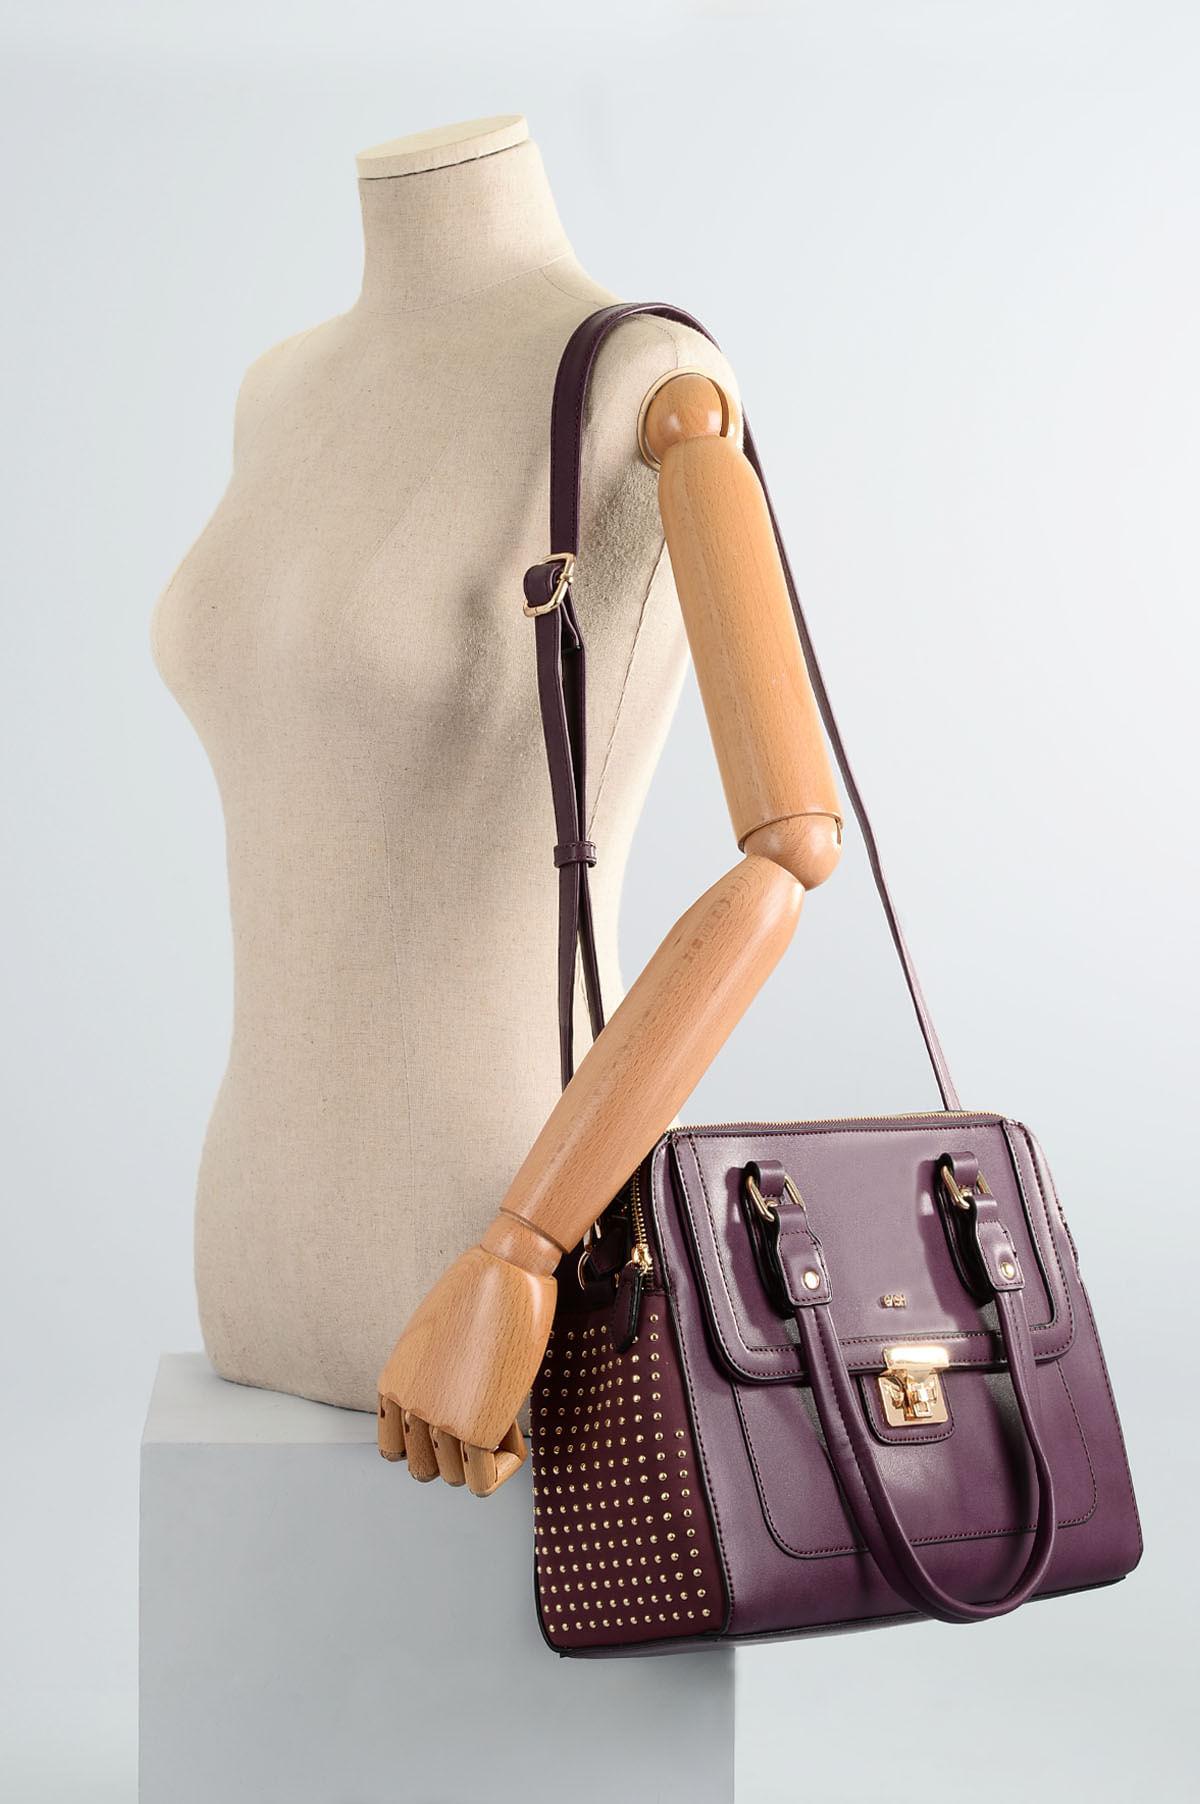 972f09efd Bolsa Feminina Gash Sawier SINT - VINHO - Mundial Calçados